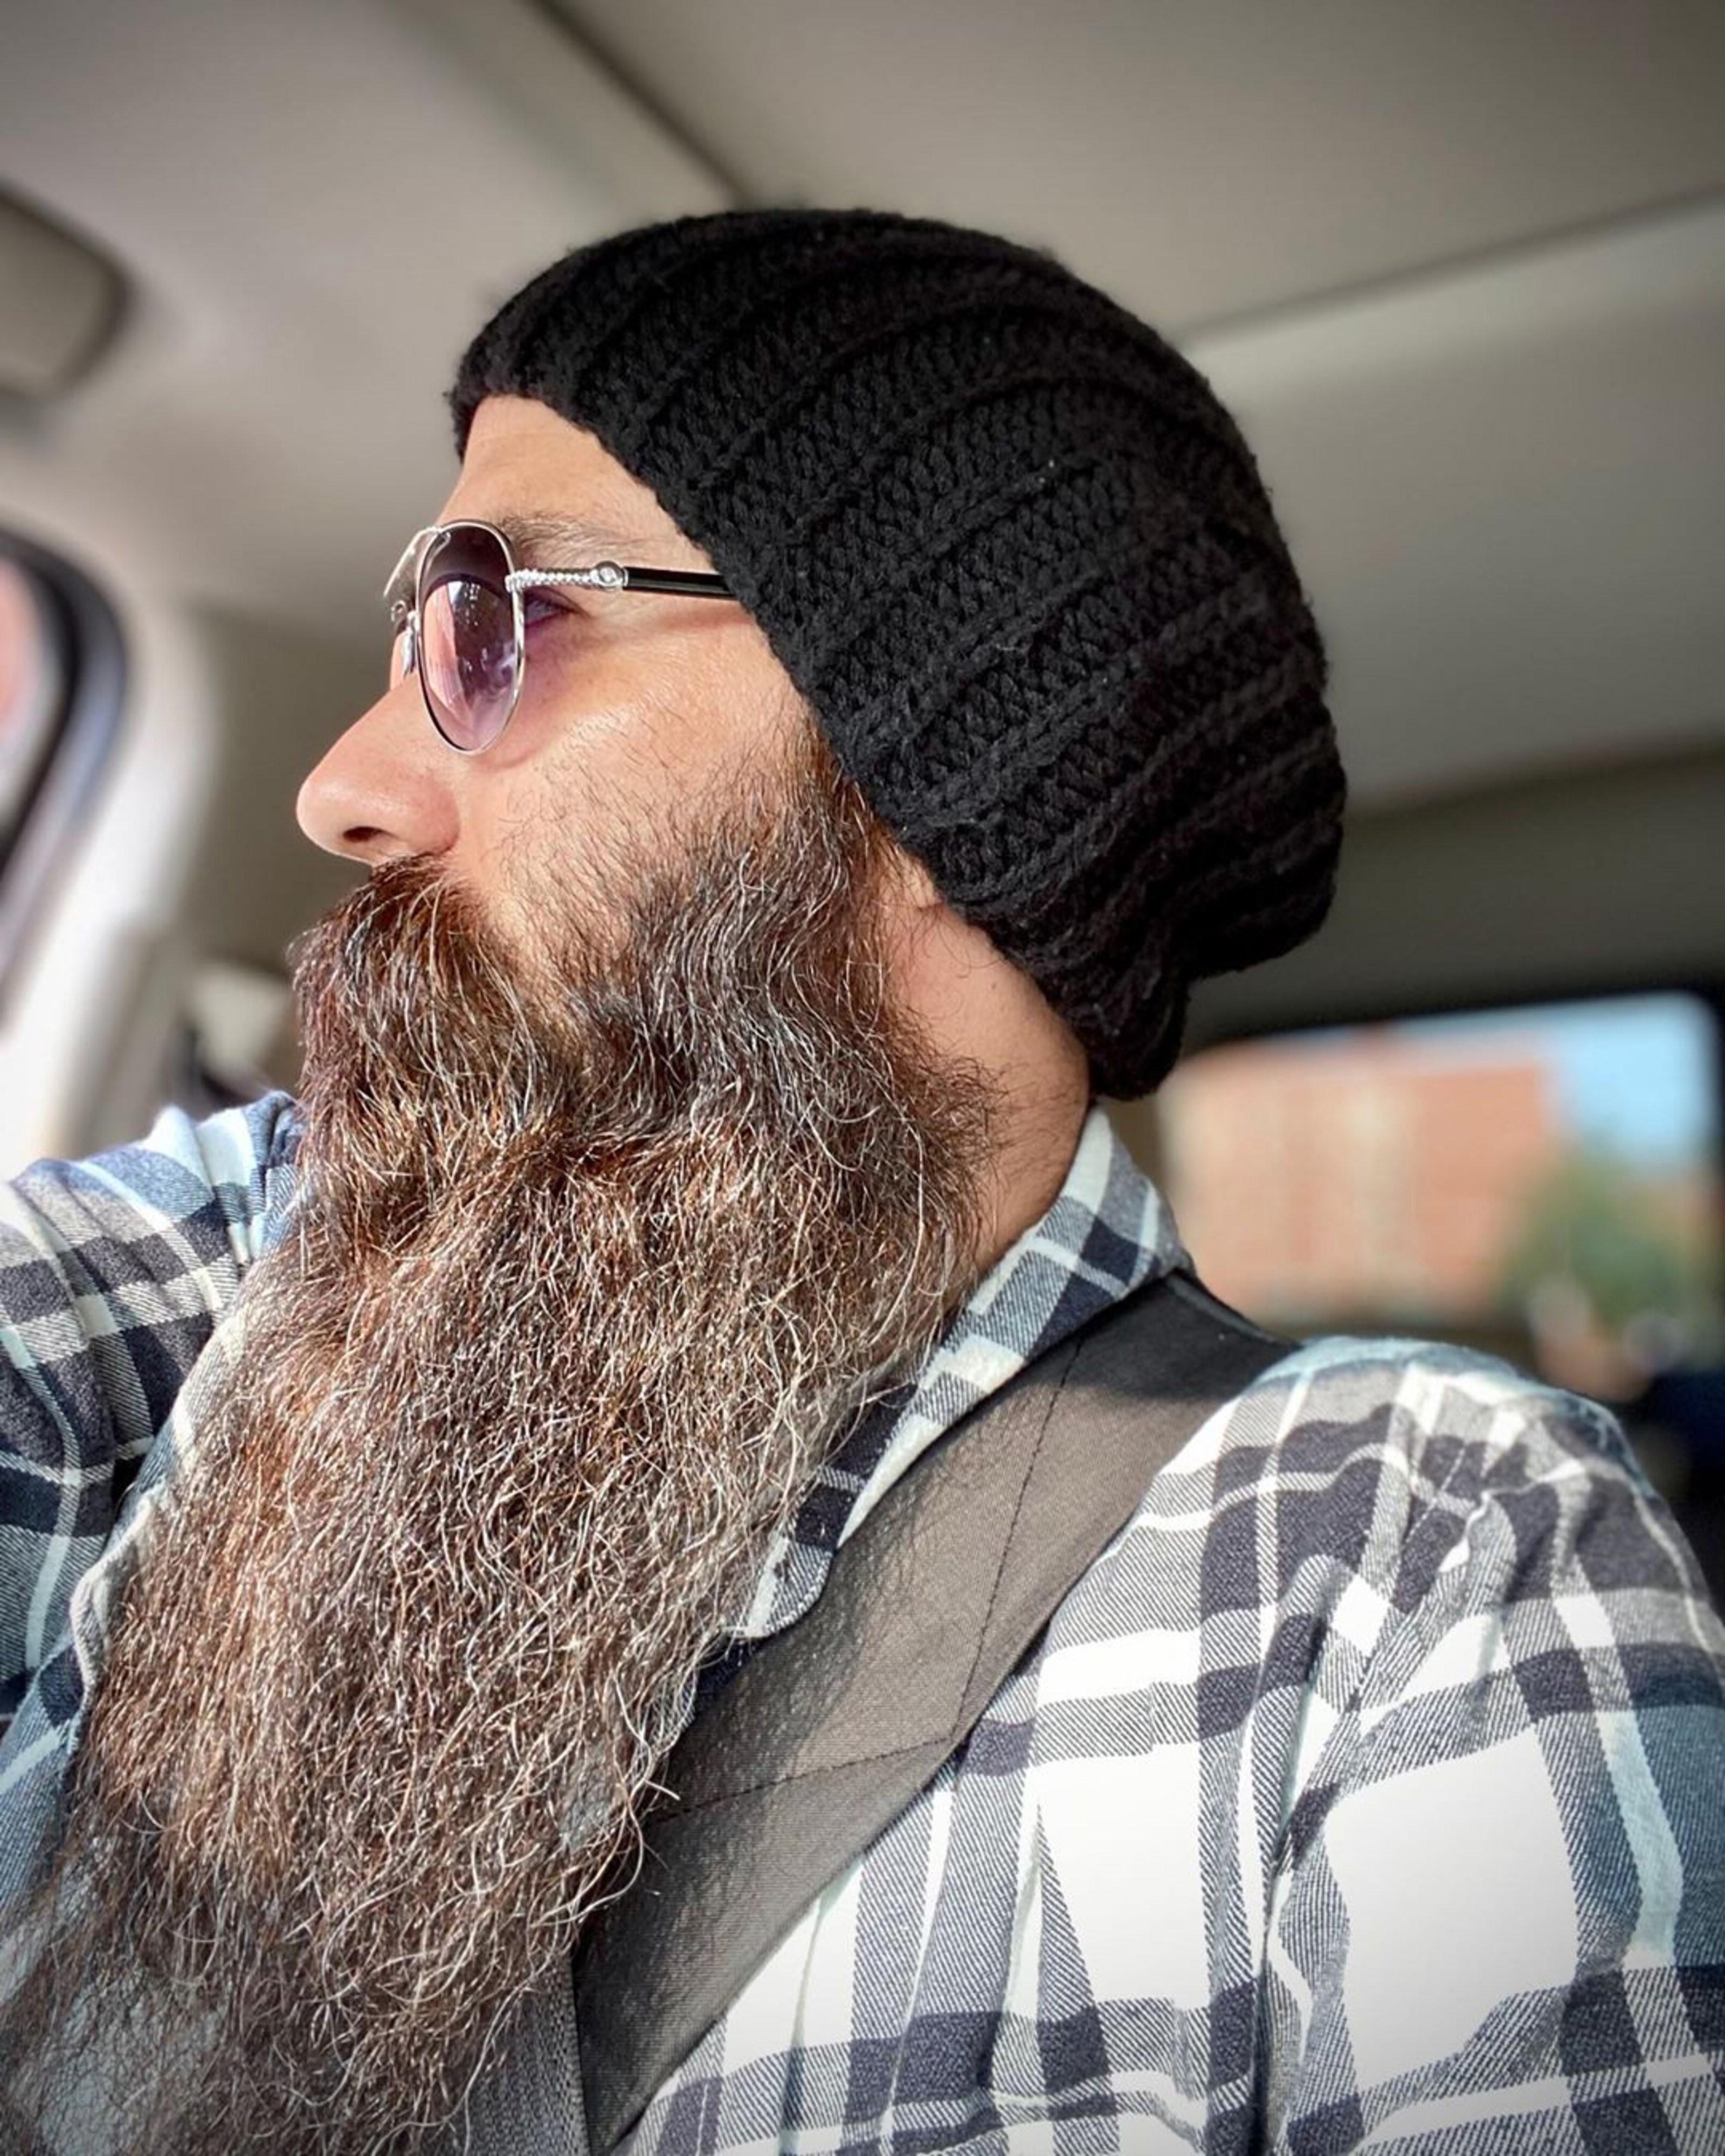 A long chin beard for stylish men.